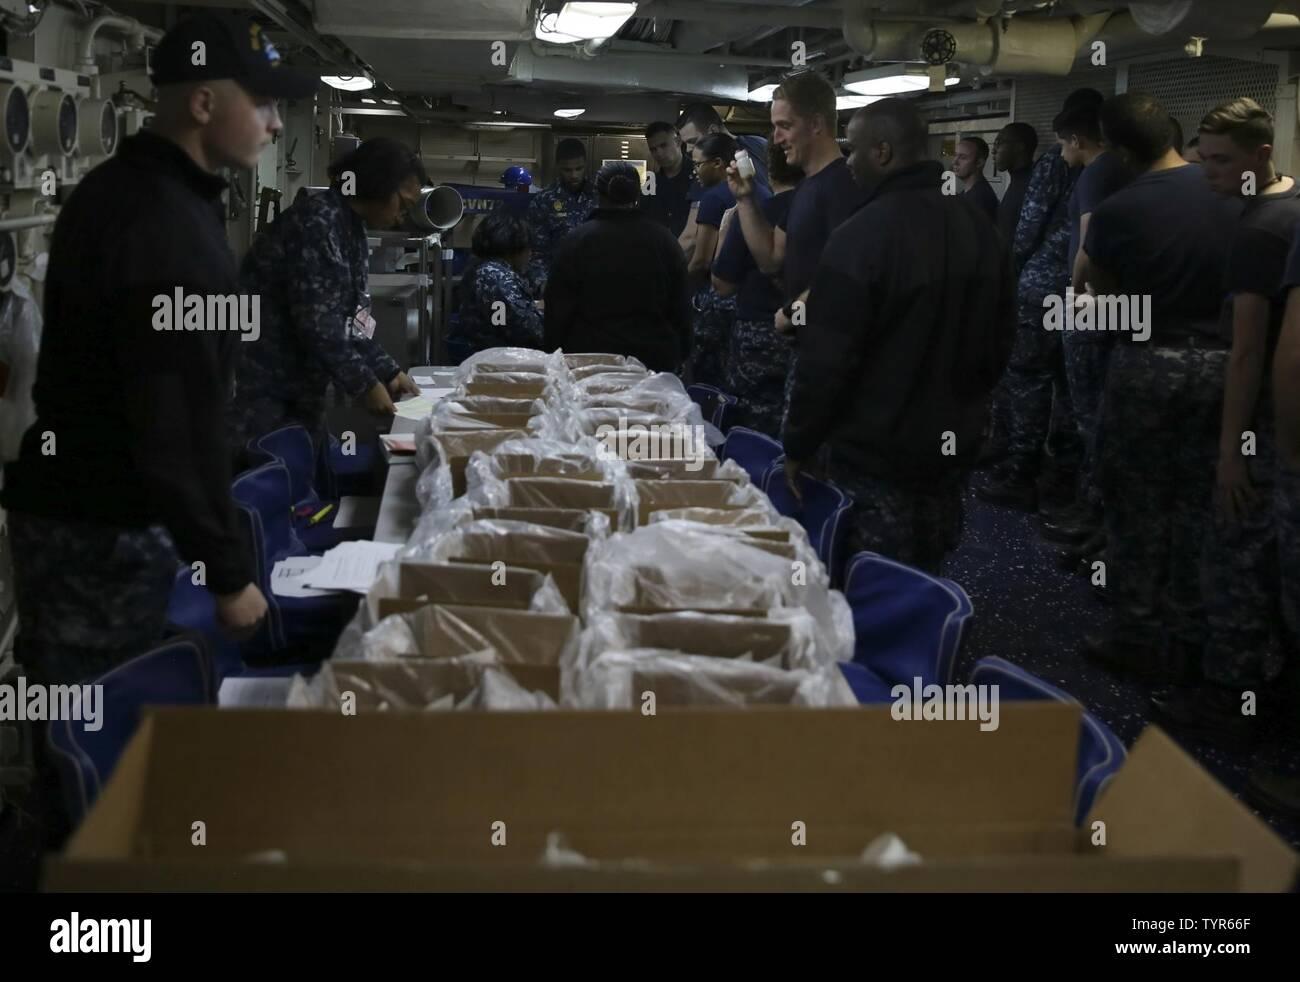 Sasebo Naval Base Stock Photos & Sasebo Naval Base Stock Images - Alamy